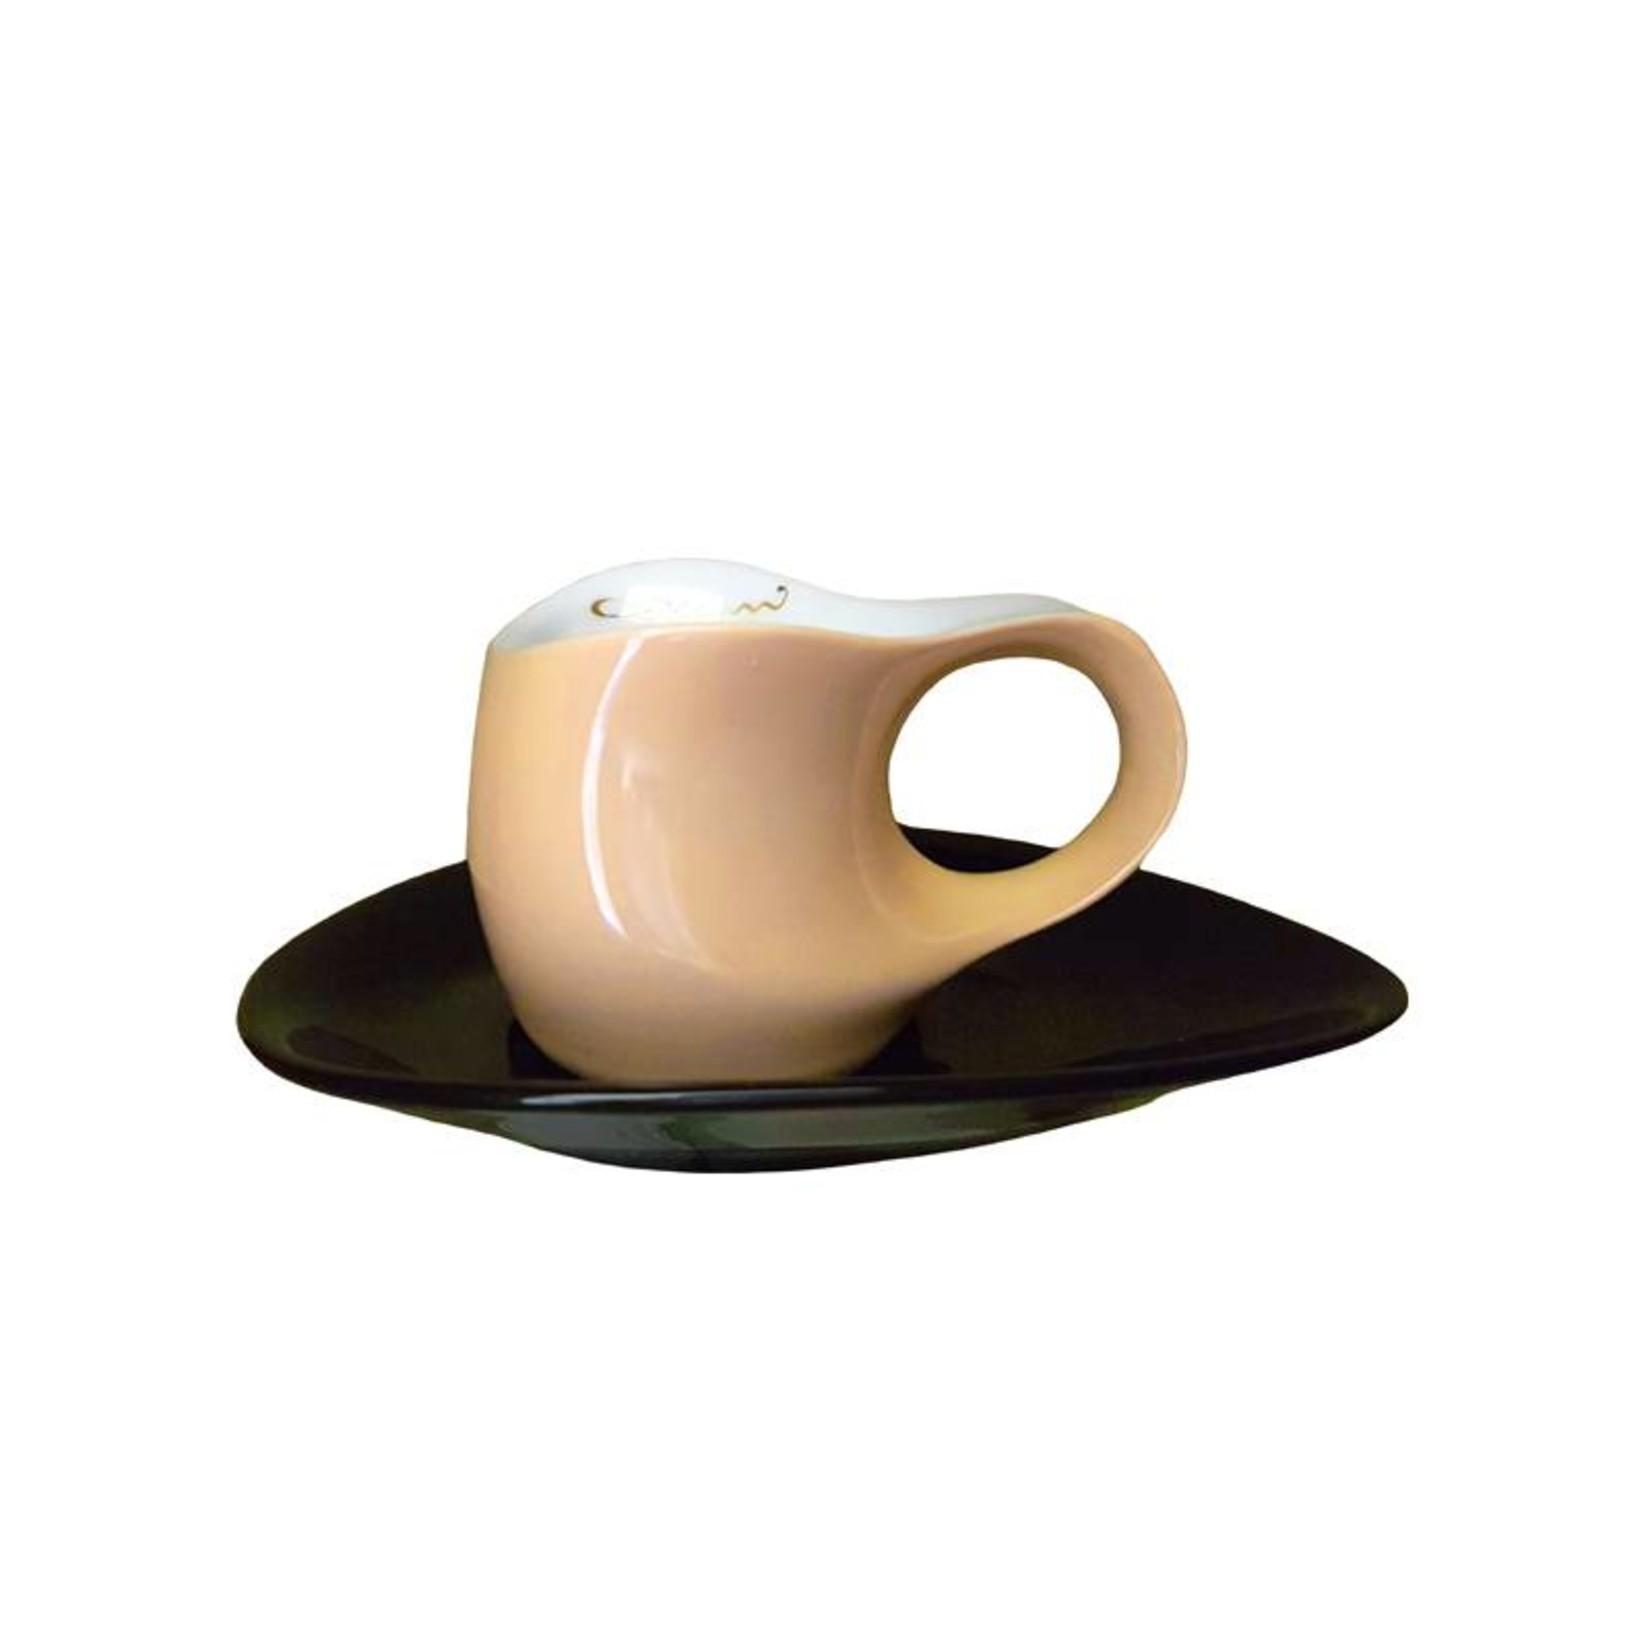 Colani Porzellanserie Colani Espressotasse | Tasse inkl. Unterteller | sand